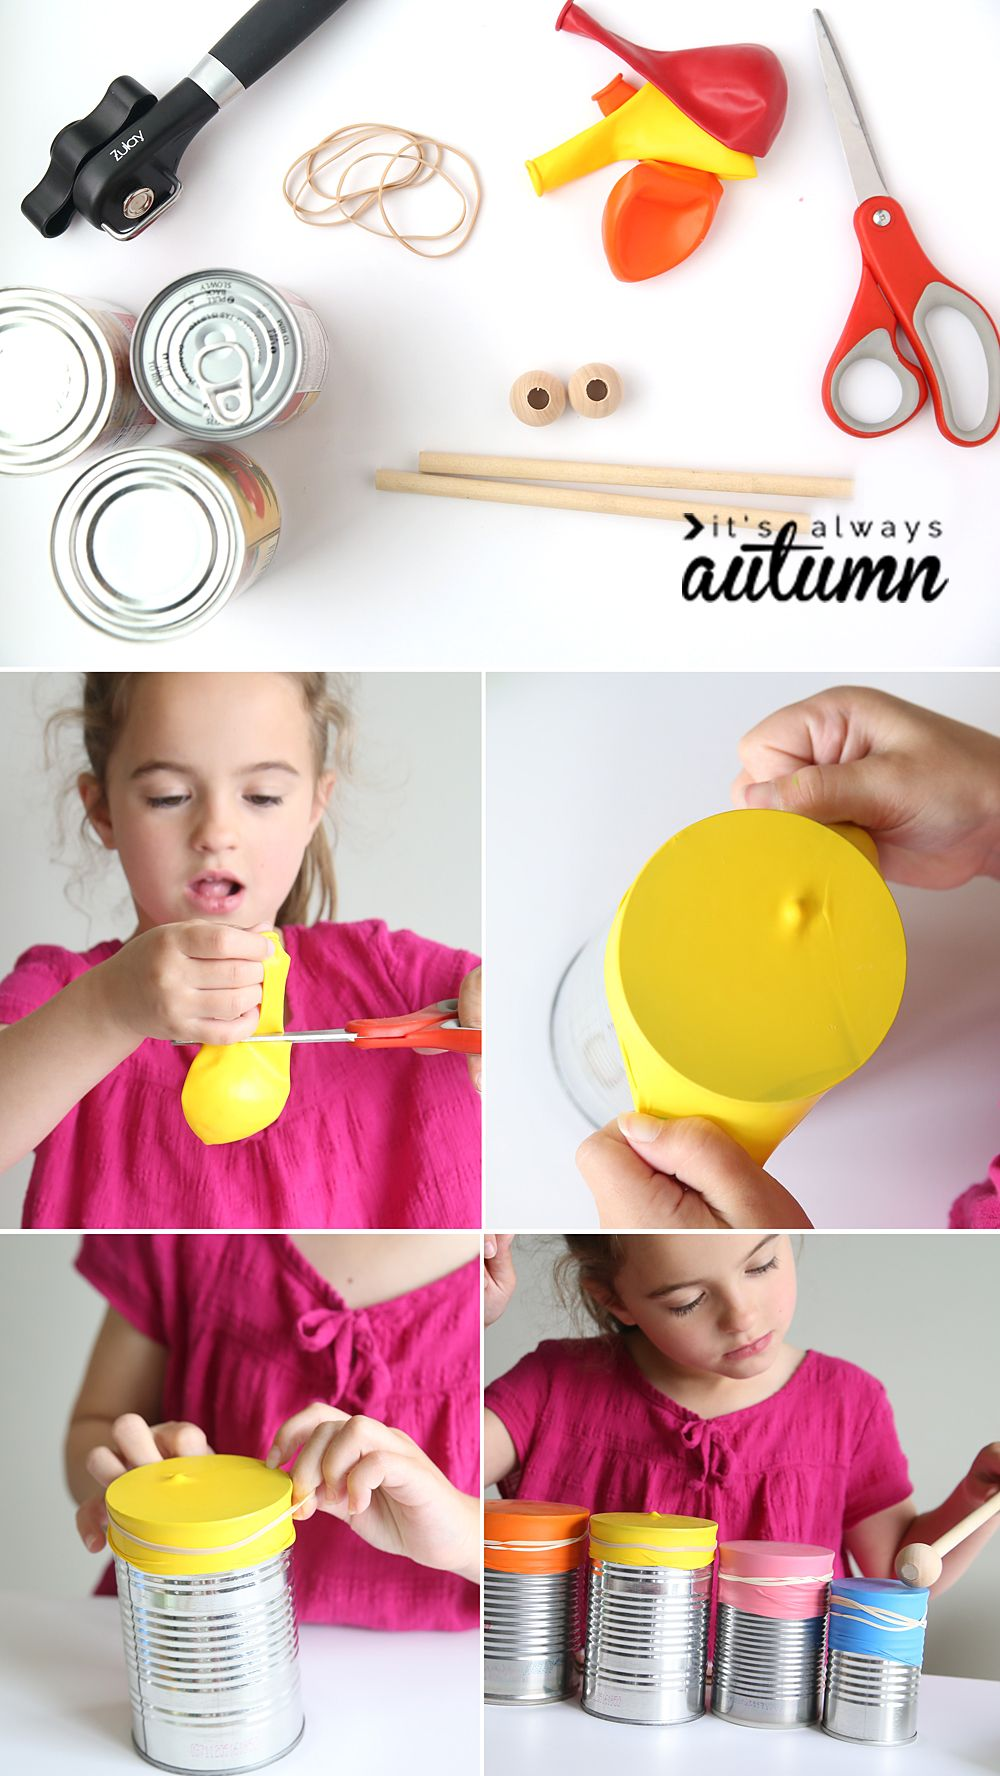 kid made drum set and kazoo easy indoor craft – It's Always Autumn